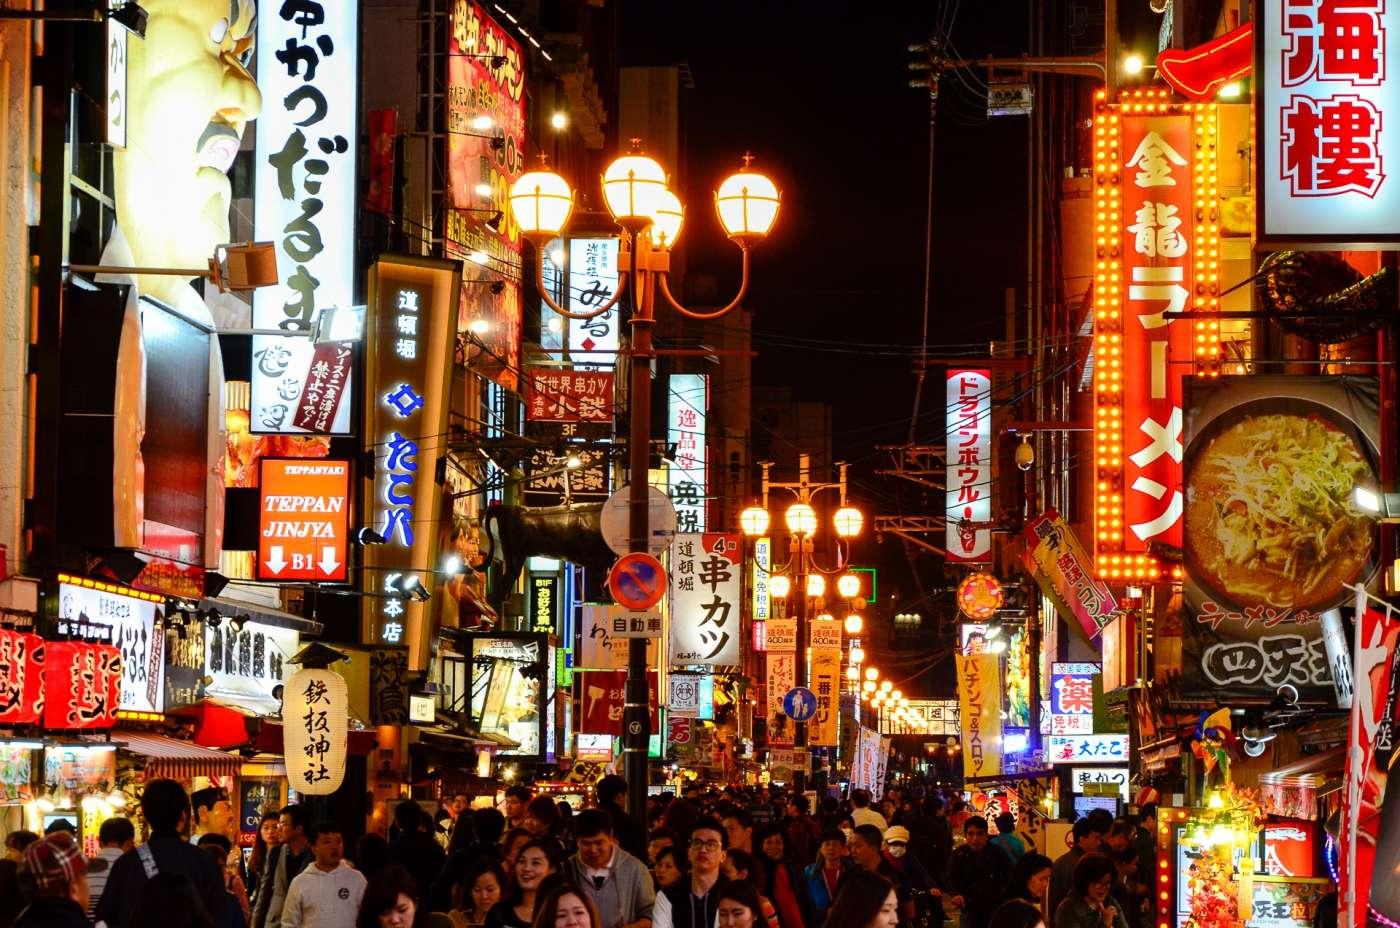 brancher à Osaka 100 site de rencontre au Canada